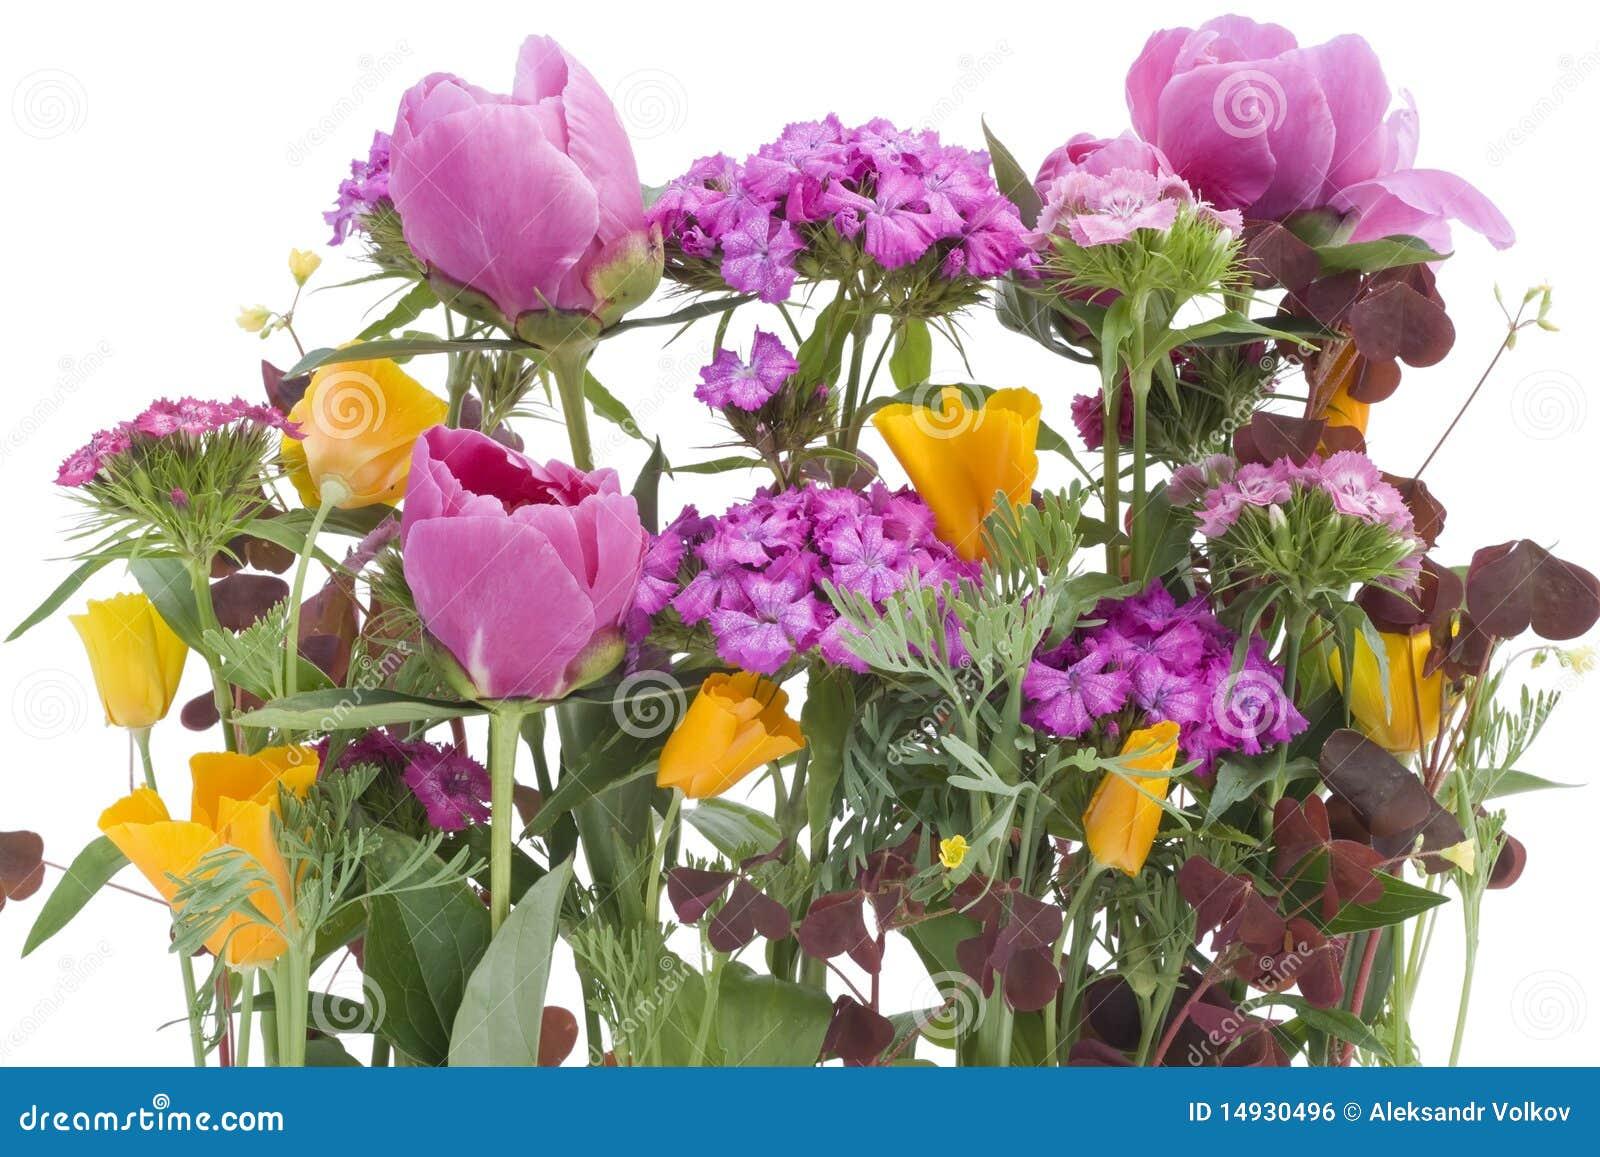 Ugly Bouquet Background Royalty Free Stock Image Image